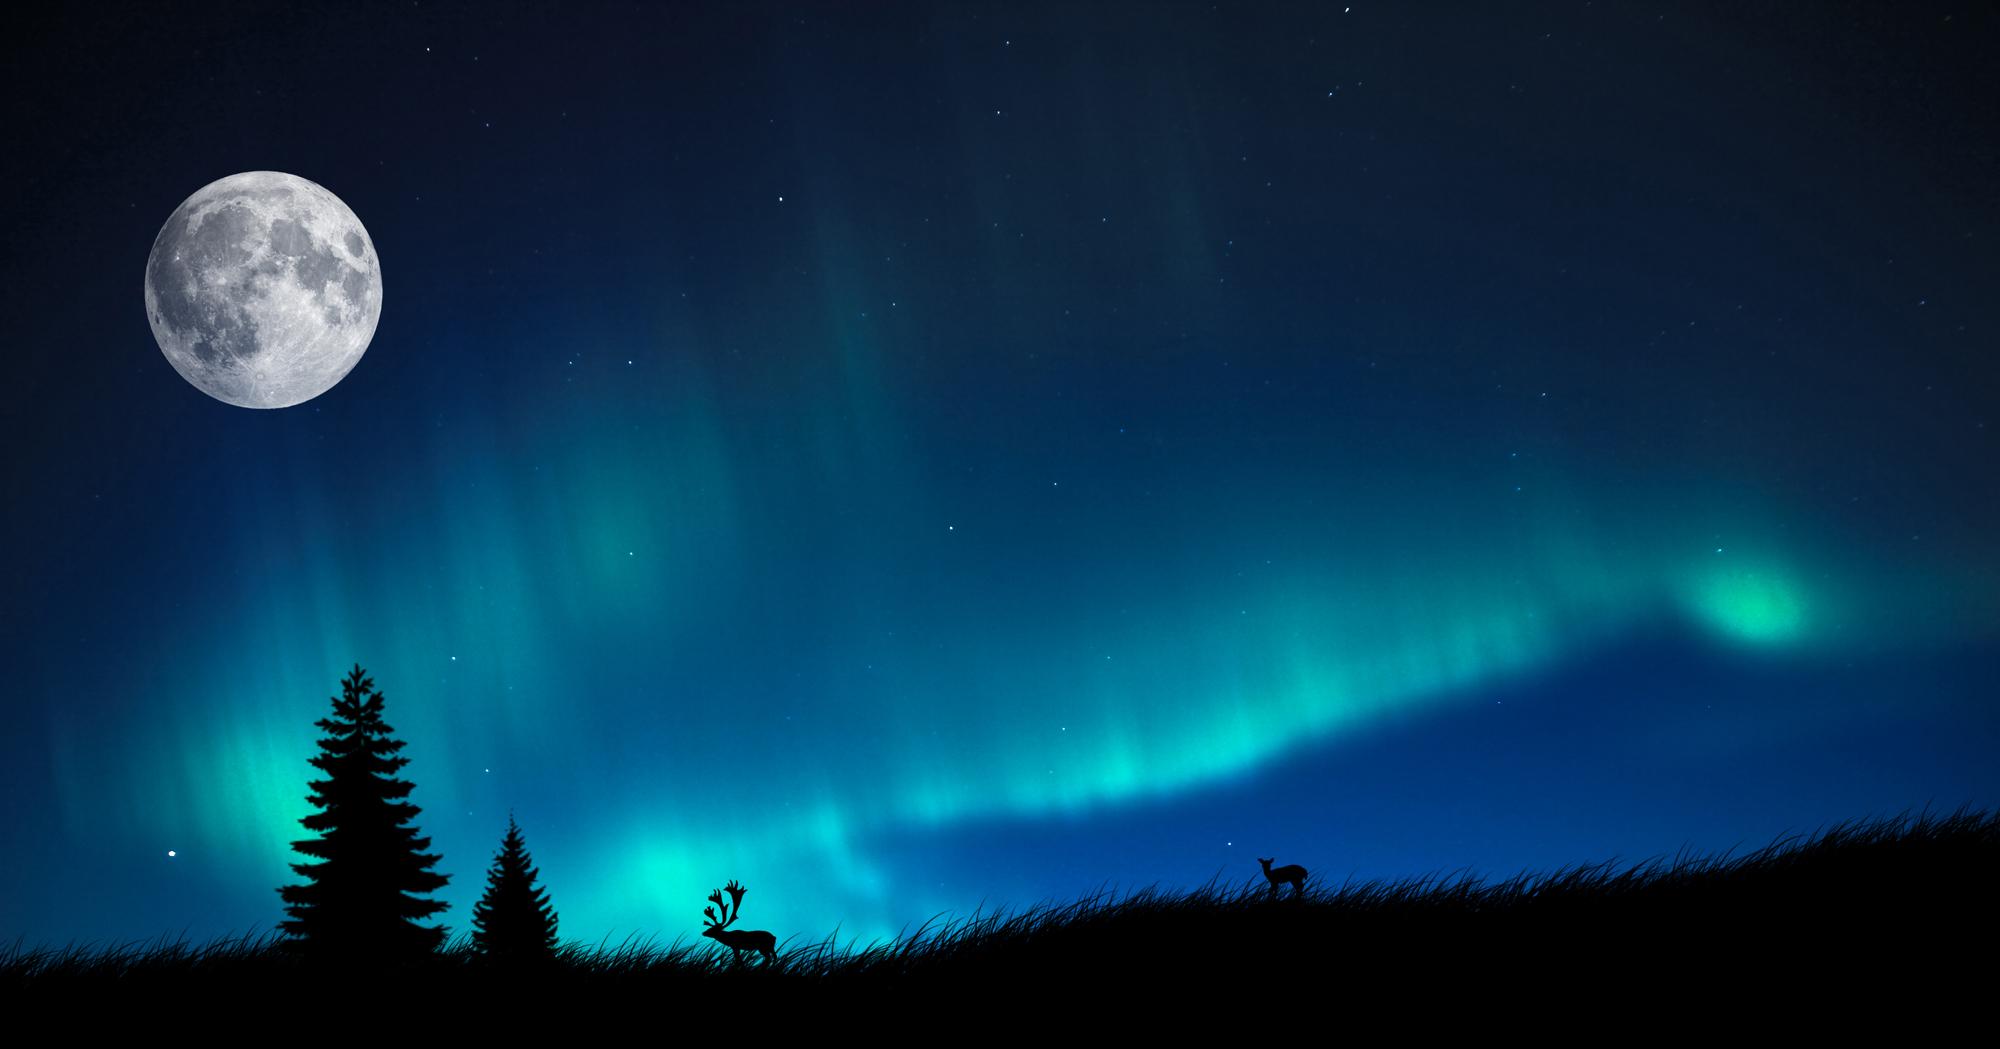 Blue Aurora Borealis - wallpaper.